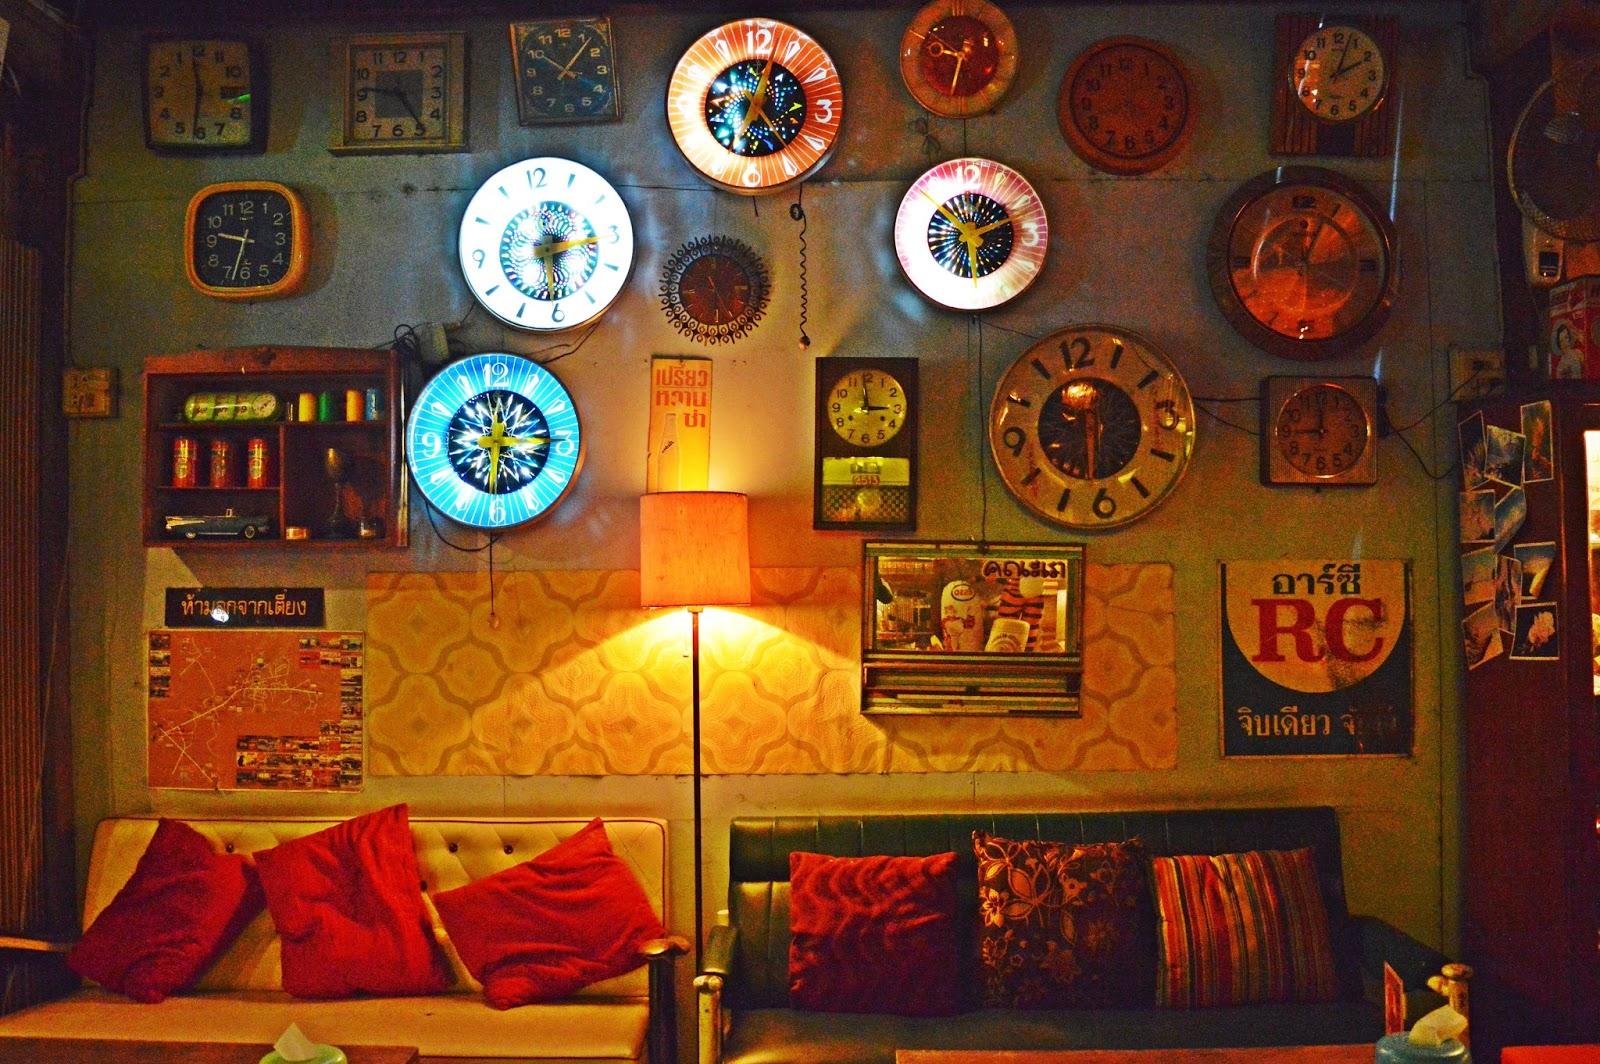 Display wall of clocks